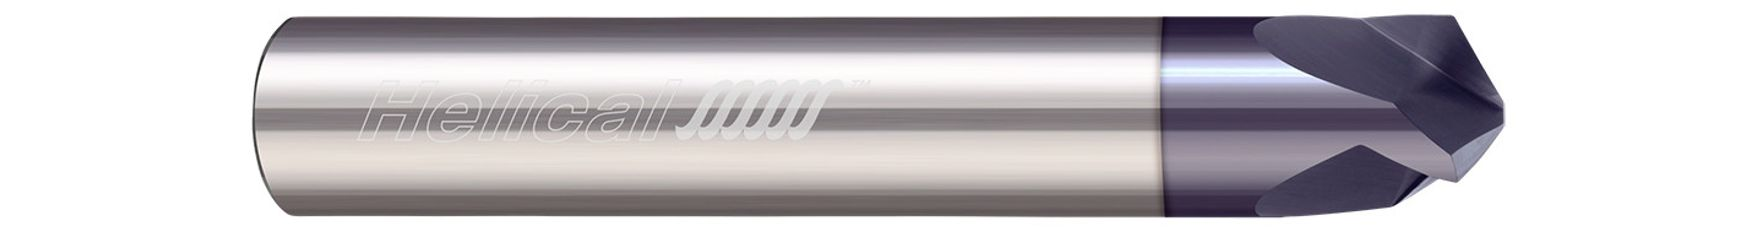 tool-details-07017